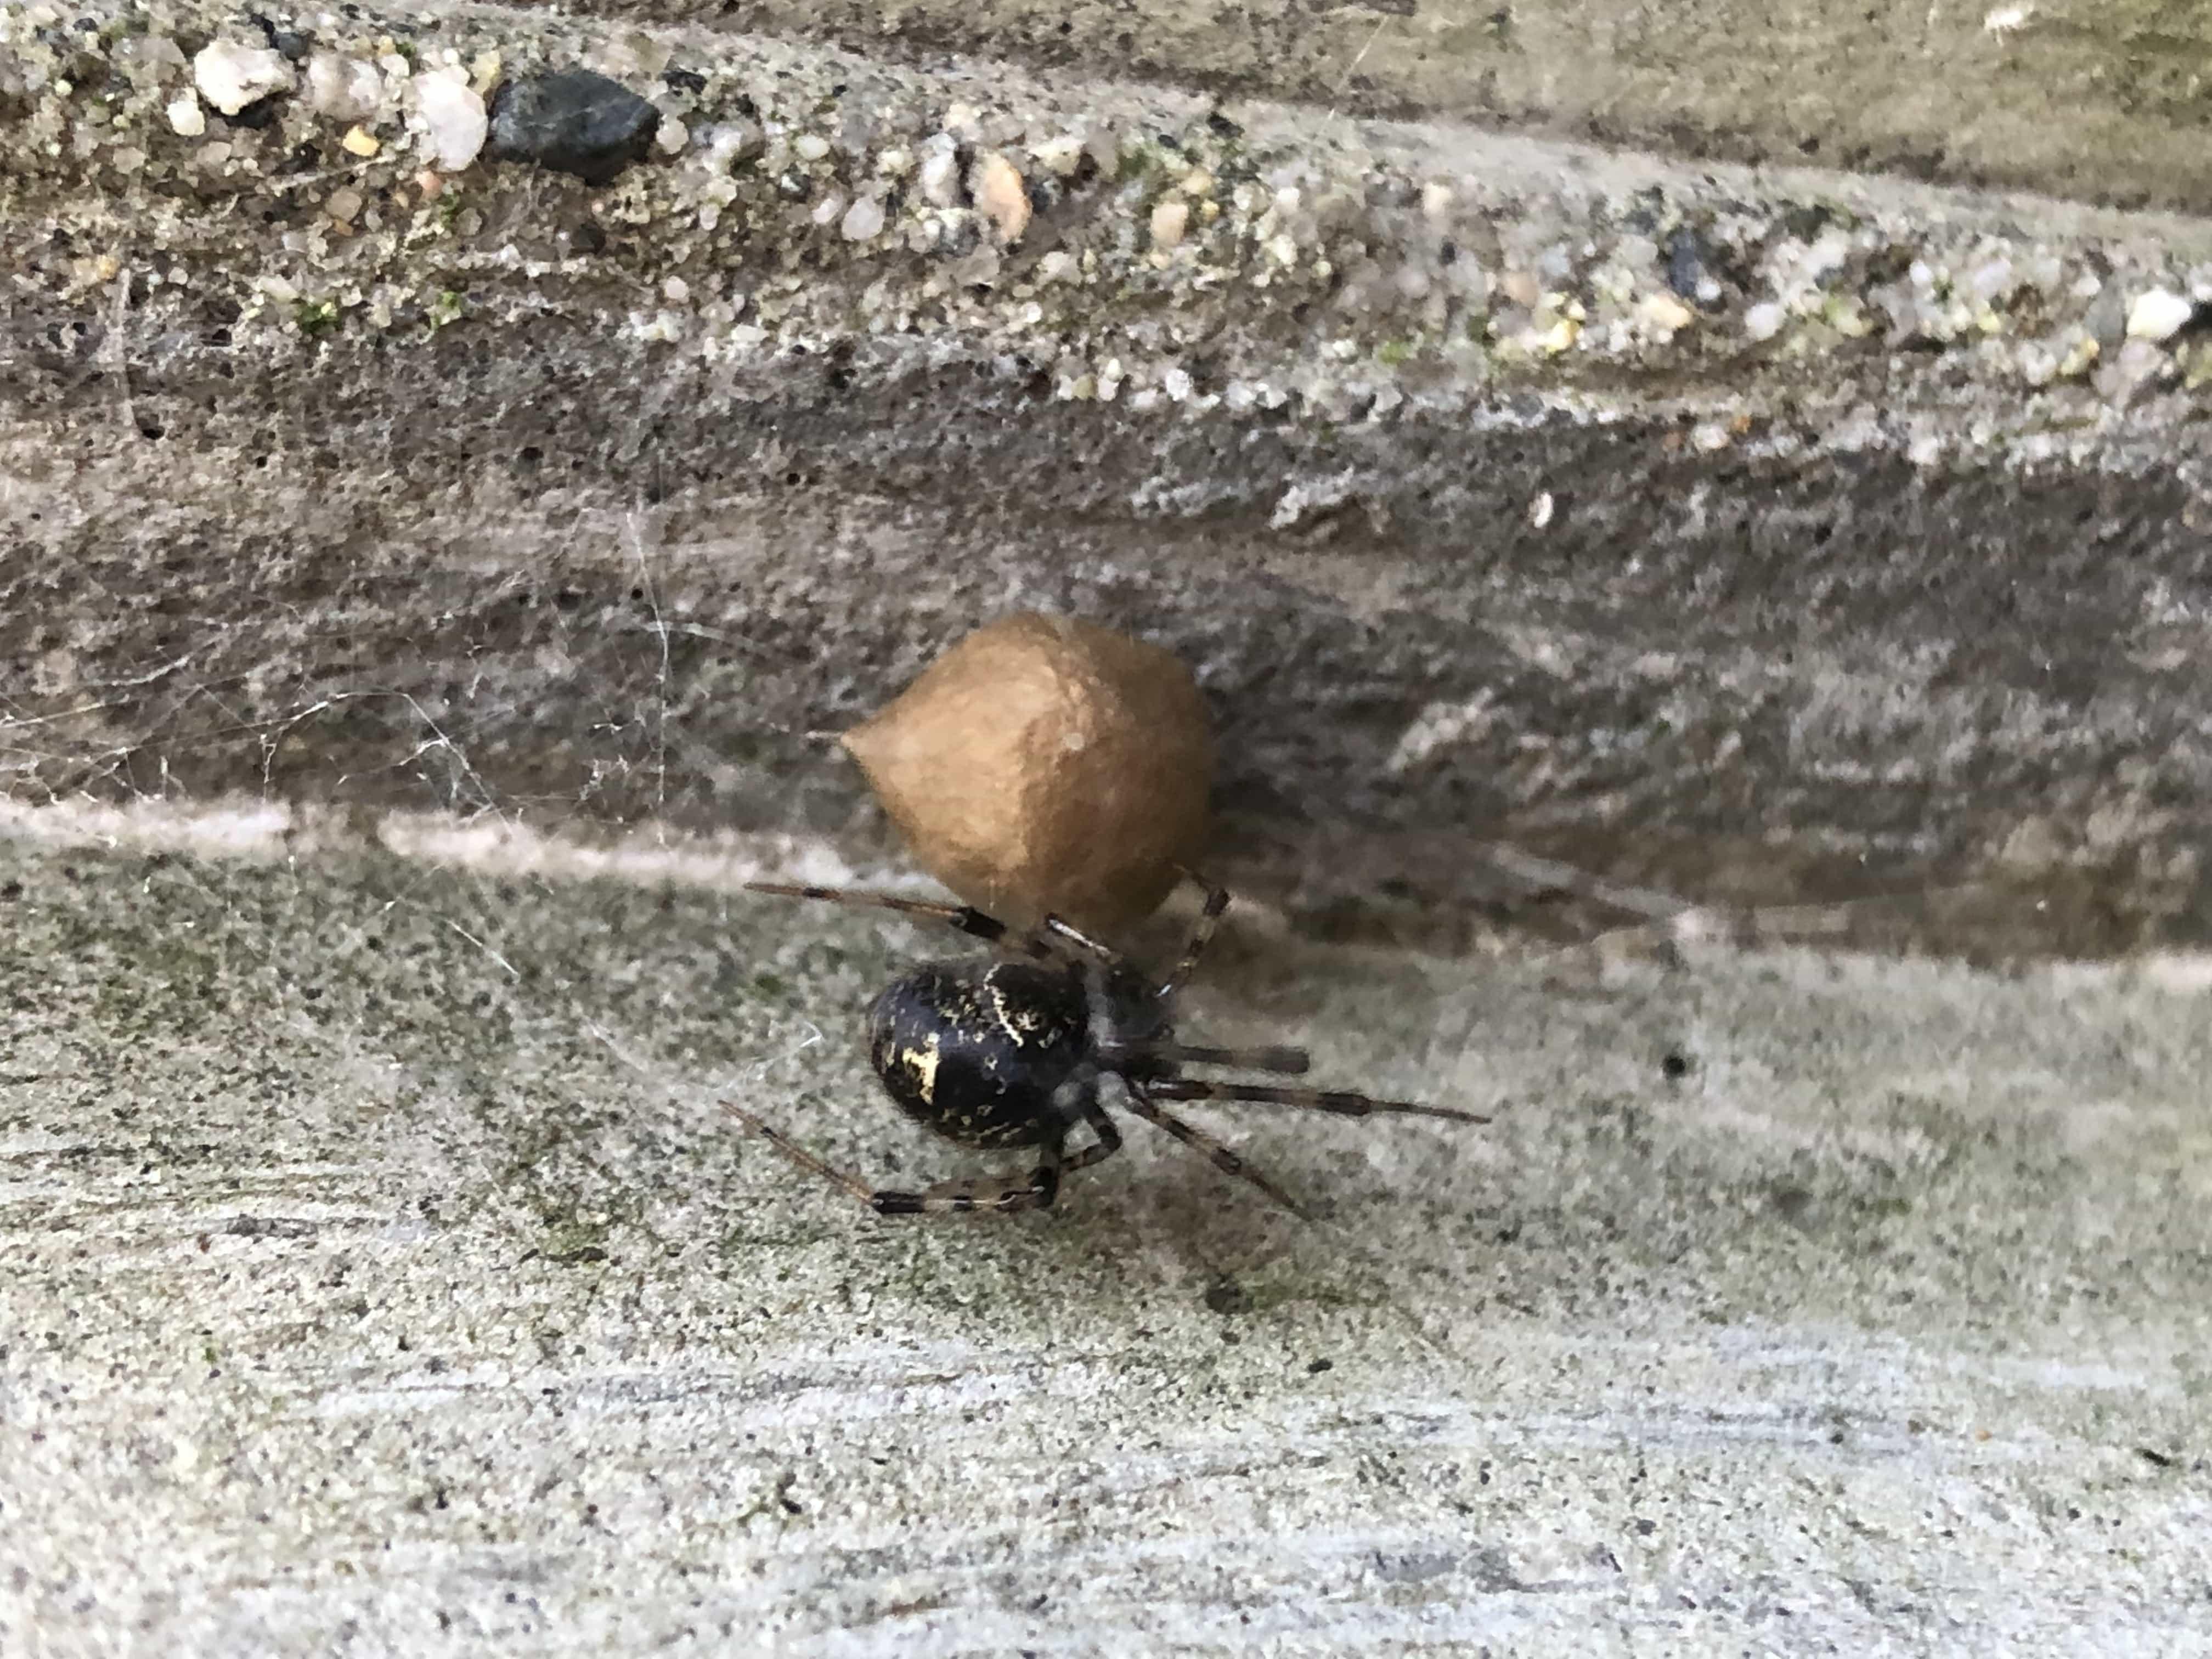 Picture of Parasteatoda tepidariorum (Common House Spider) - Female - Dorsal,Egg sacs